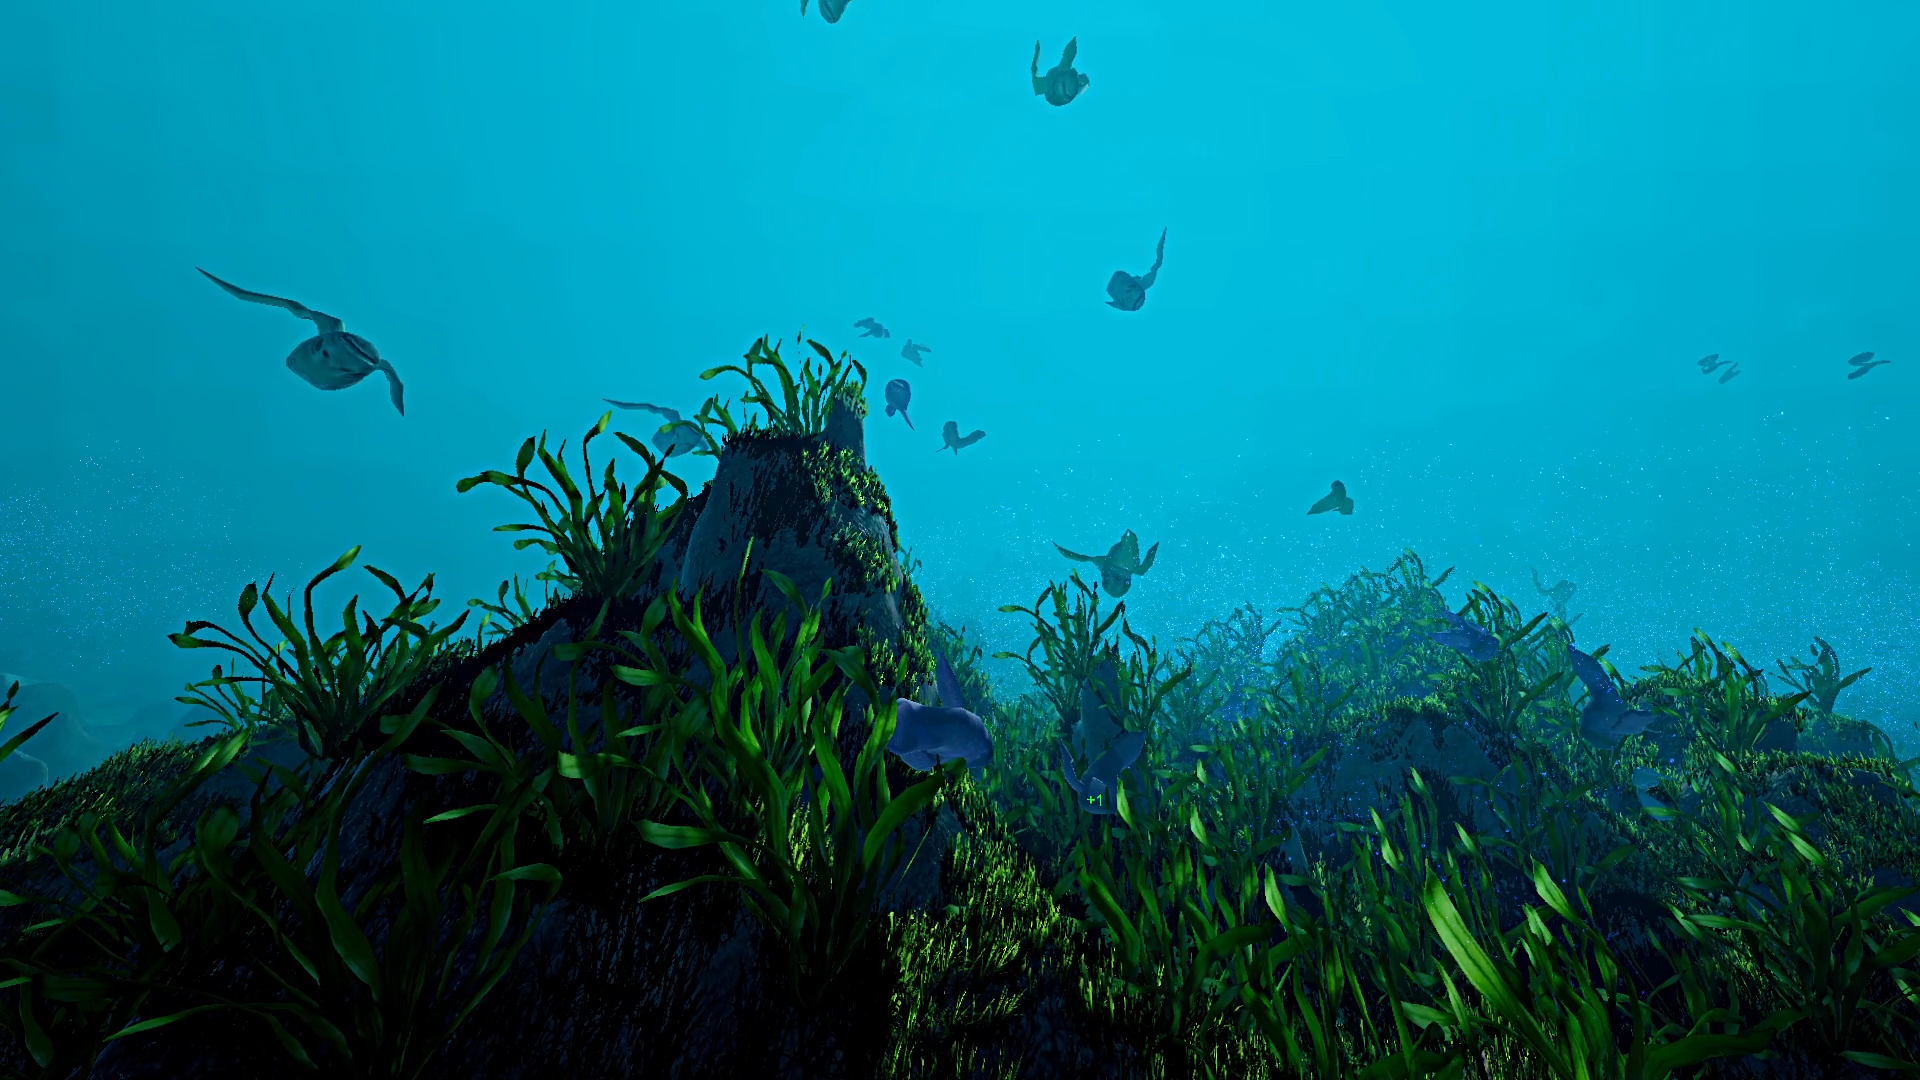 dblanecosystemscreenshot02